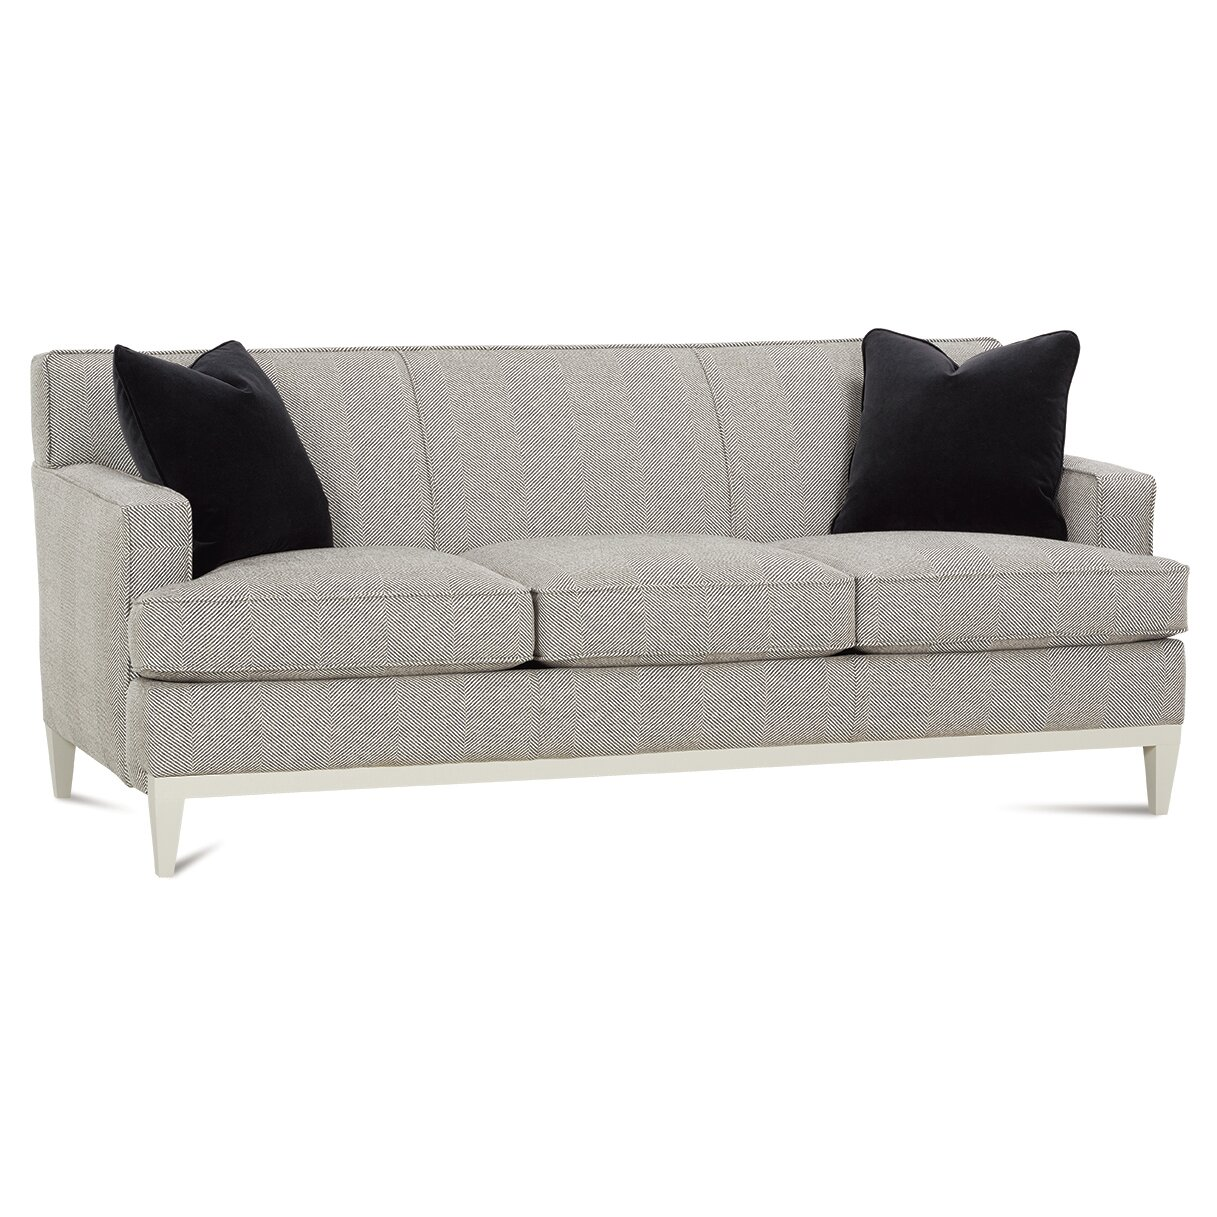 Rowe Furniture Ryder Sofa & Reviews | Wayfair